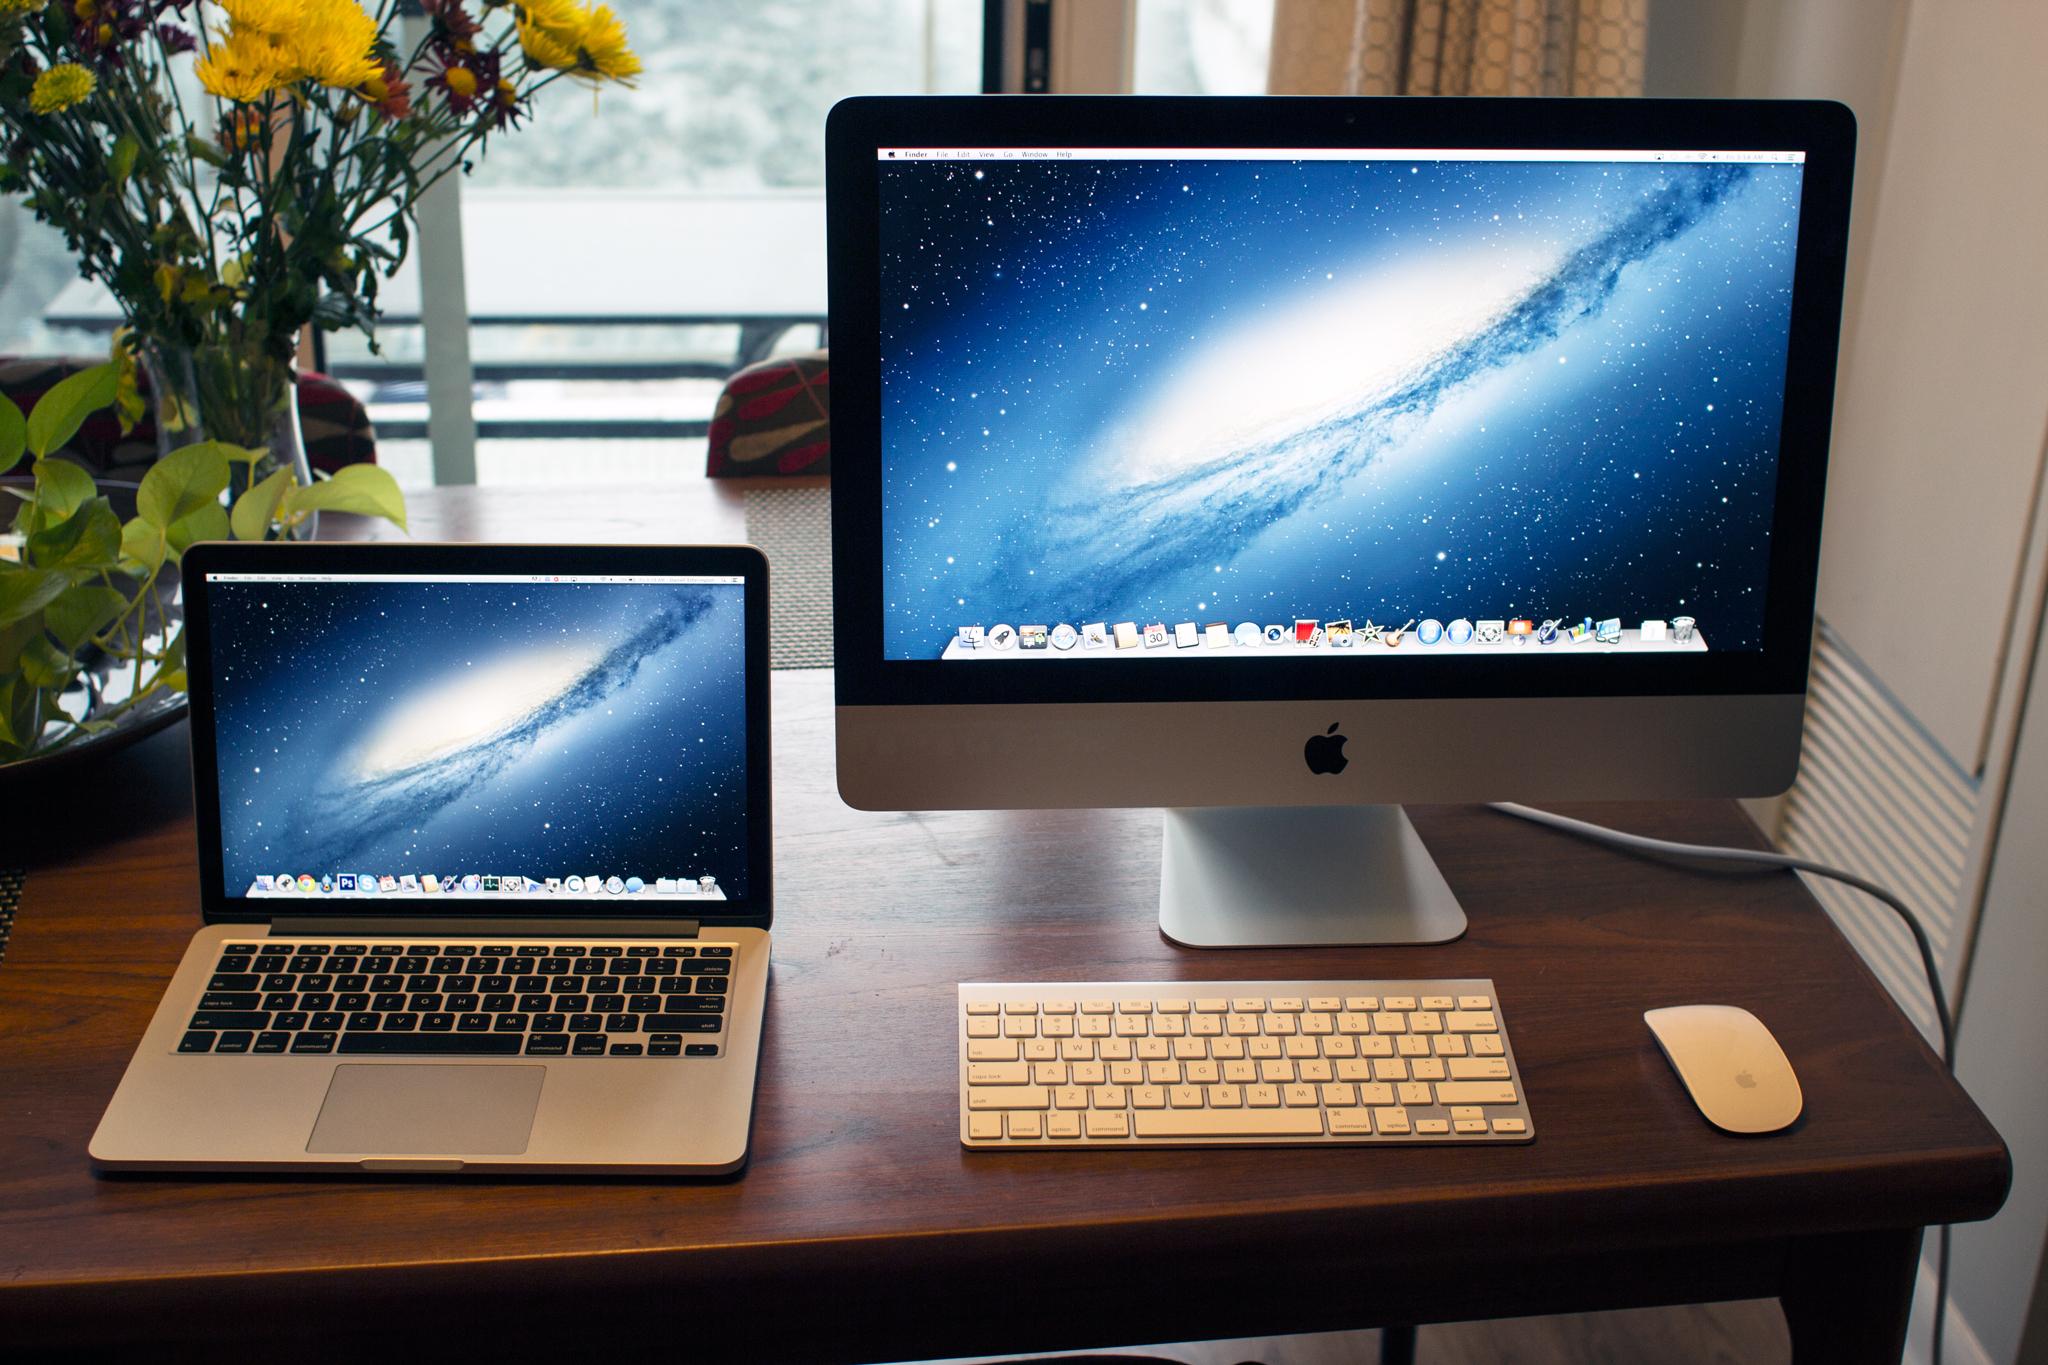 2012 iMac next to 2012 13-inch Retina MacBook Pro